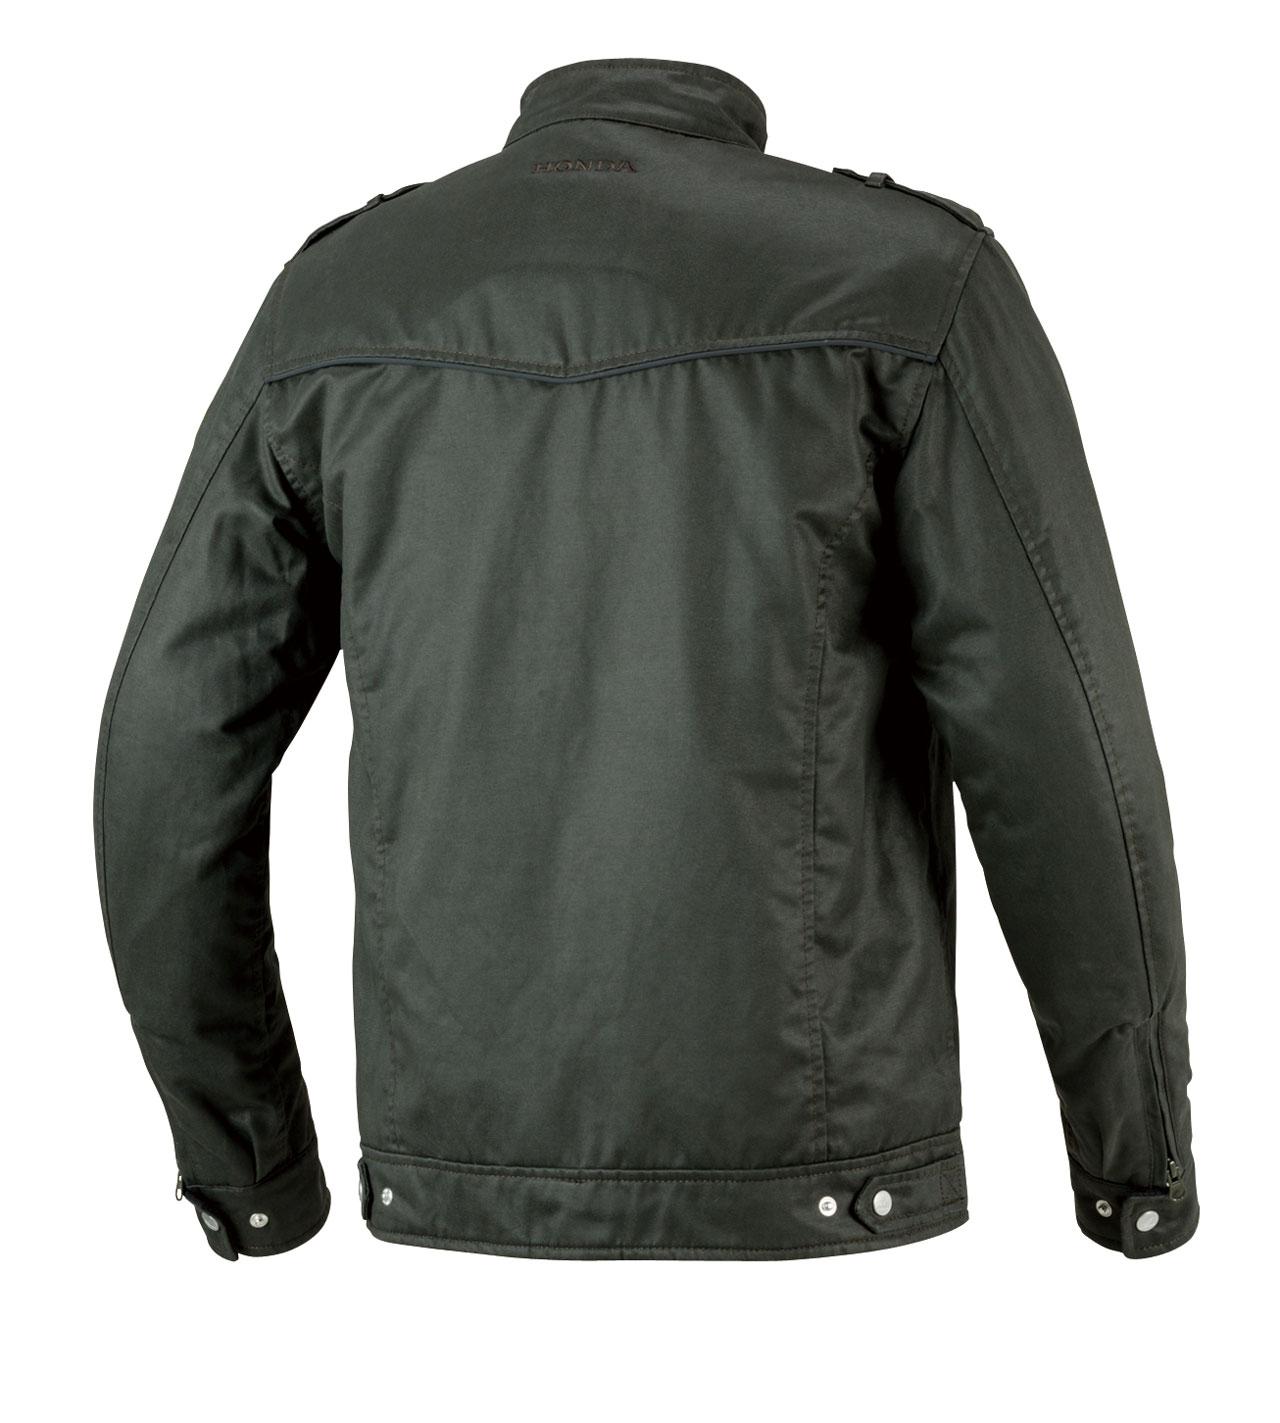 【HONDA RIDING GEAR】復古紡織外套 - 「Webike-摩托百貨」